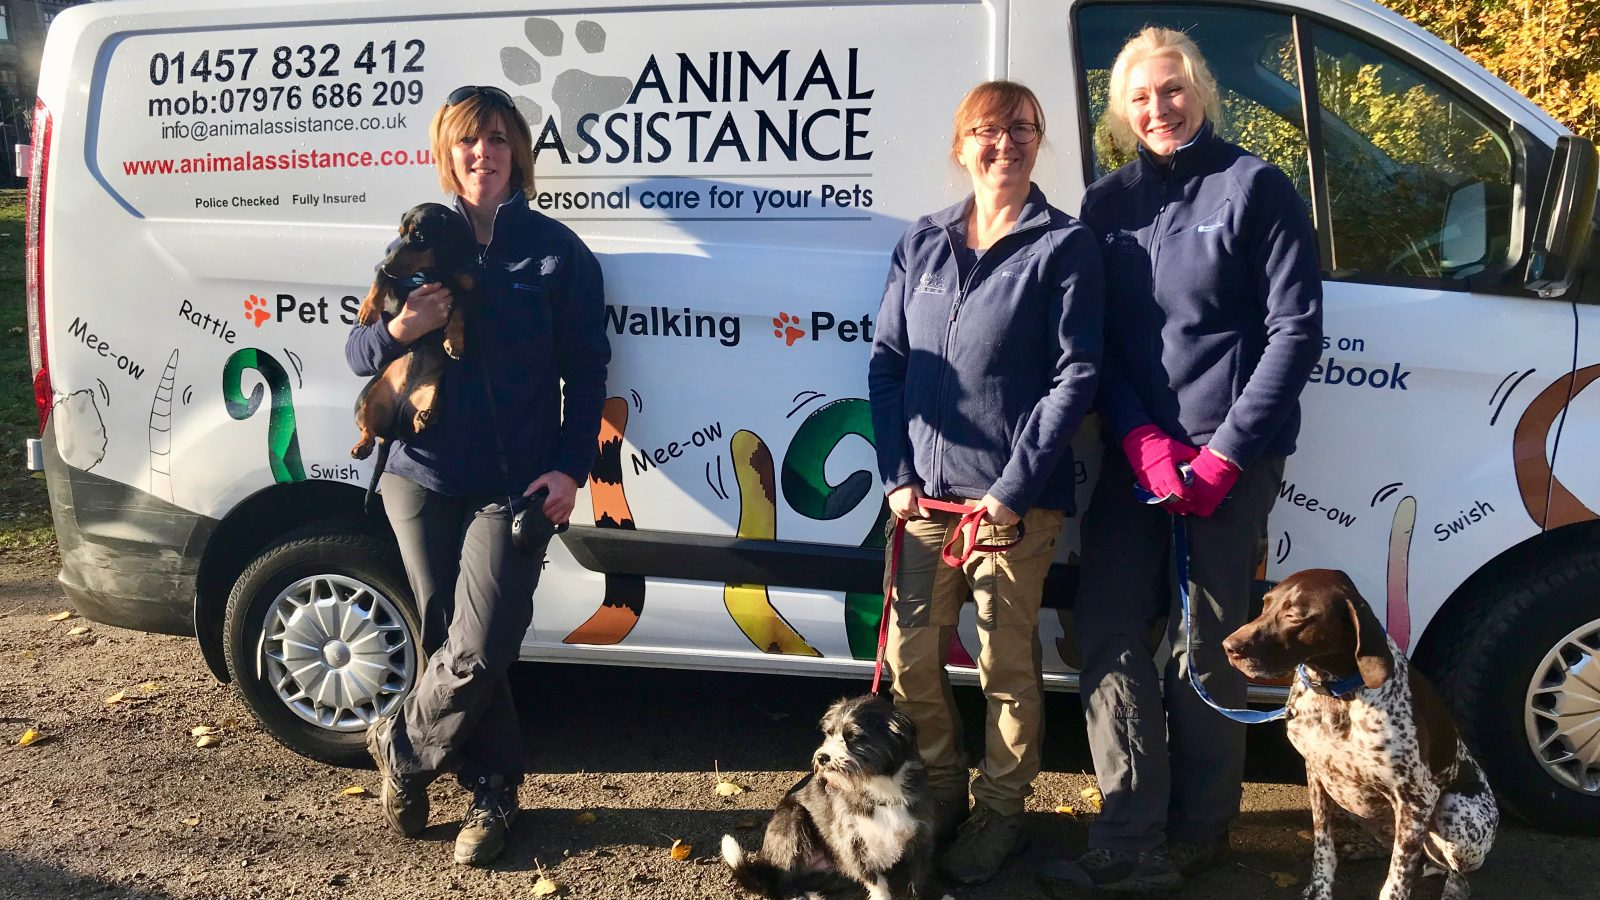 Animal Assistance